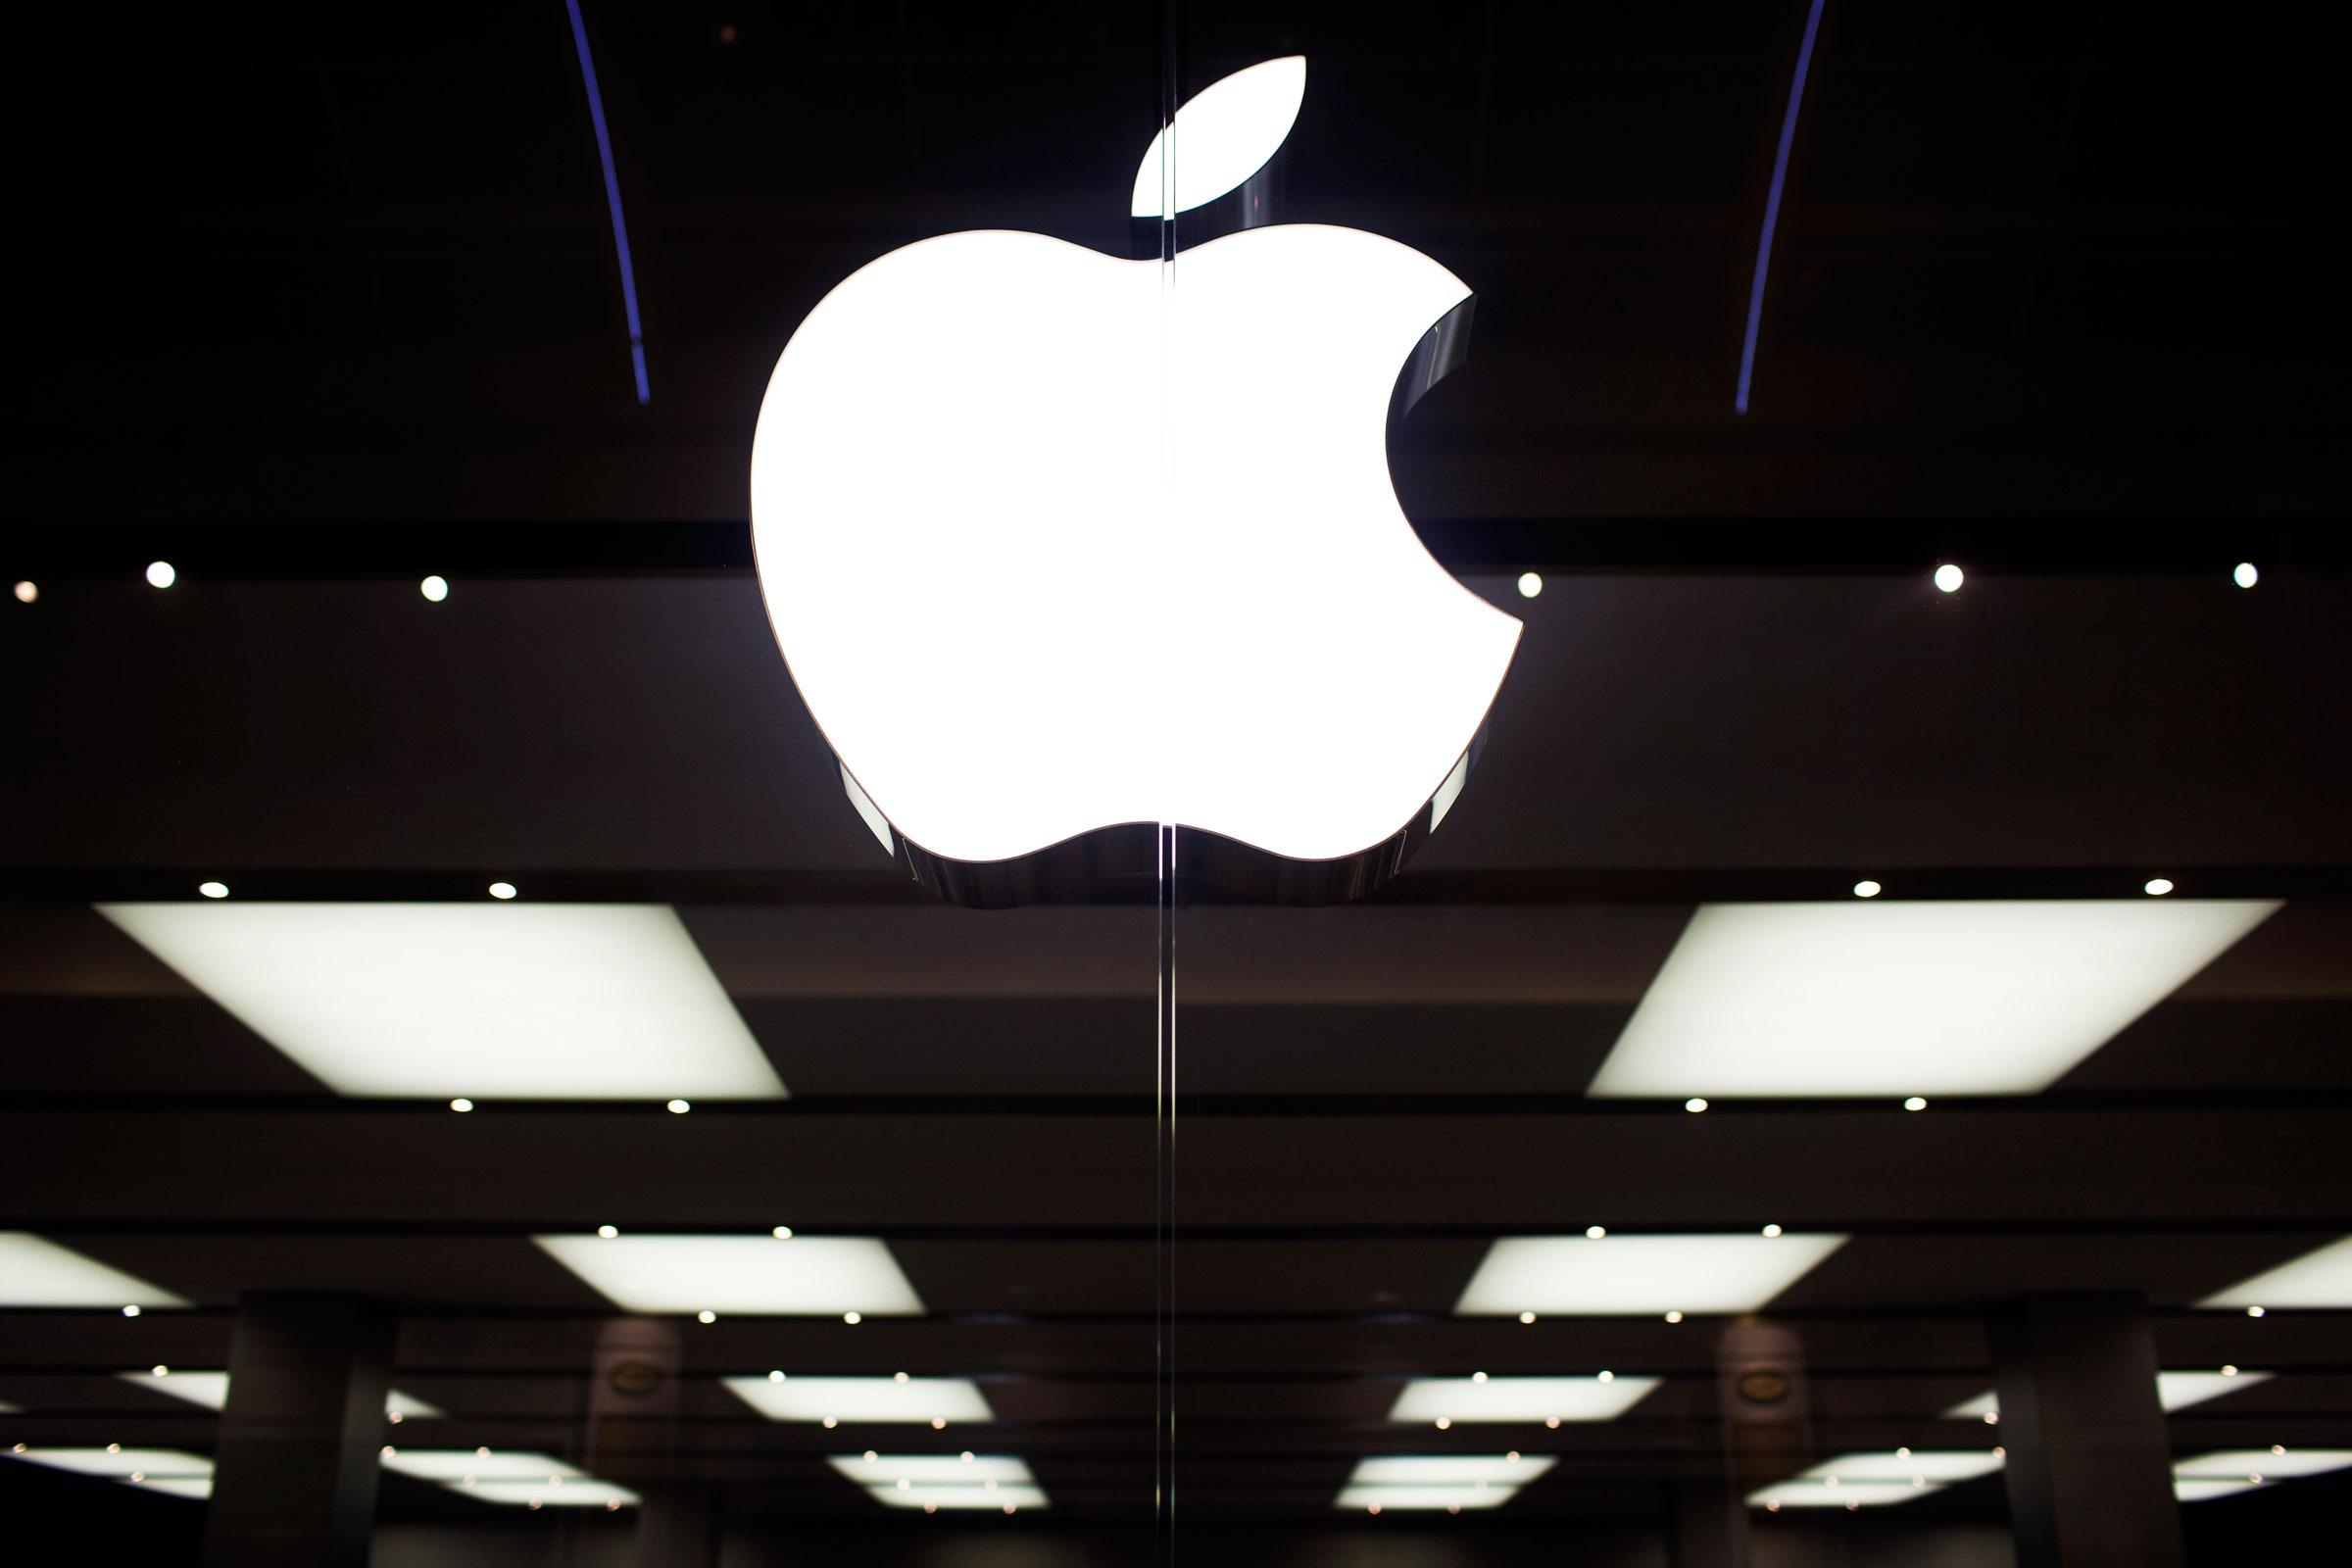 apple wwdc 2020 event